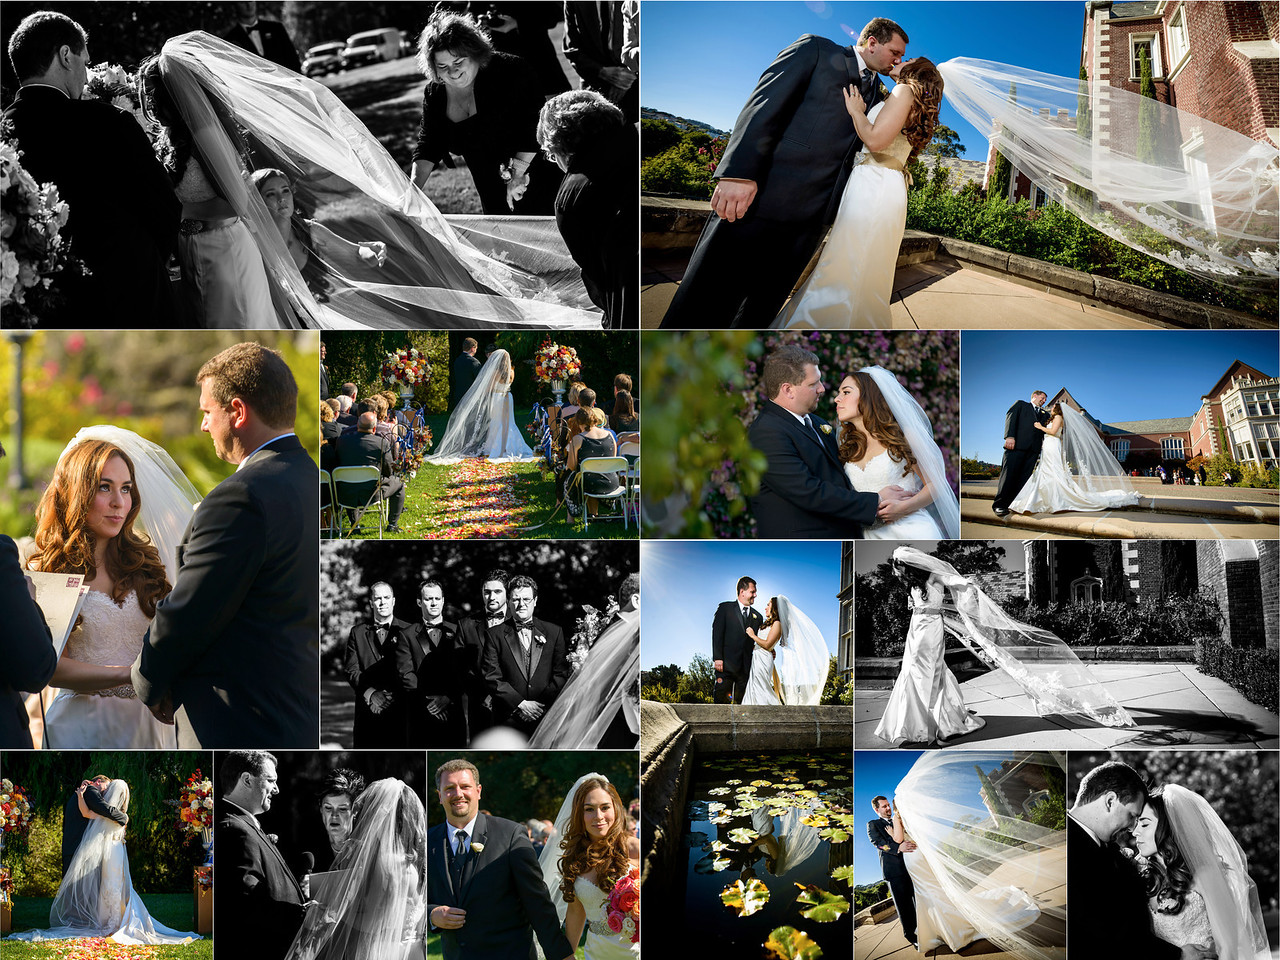 Danielle_and_Tony_Wedding_Photography_4x6_Photo_Board_03